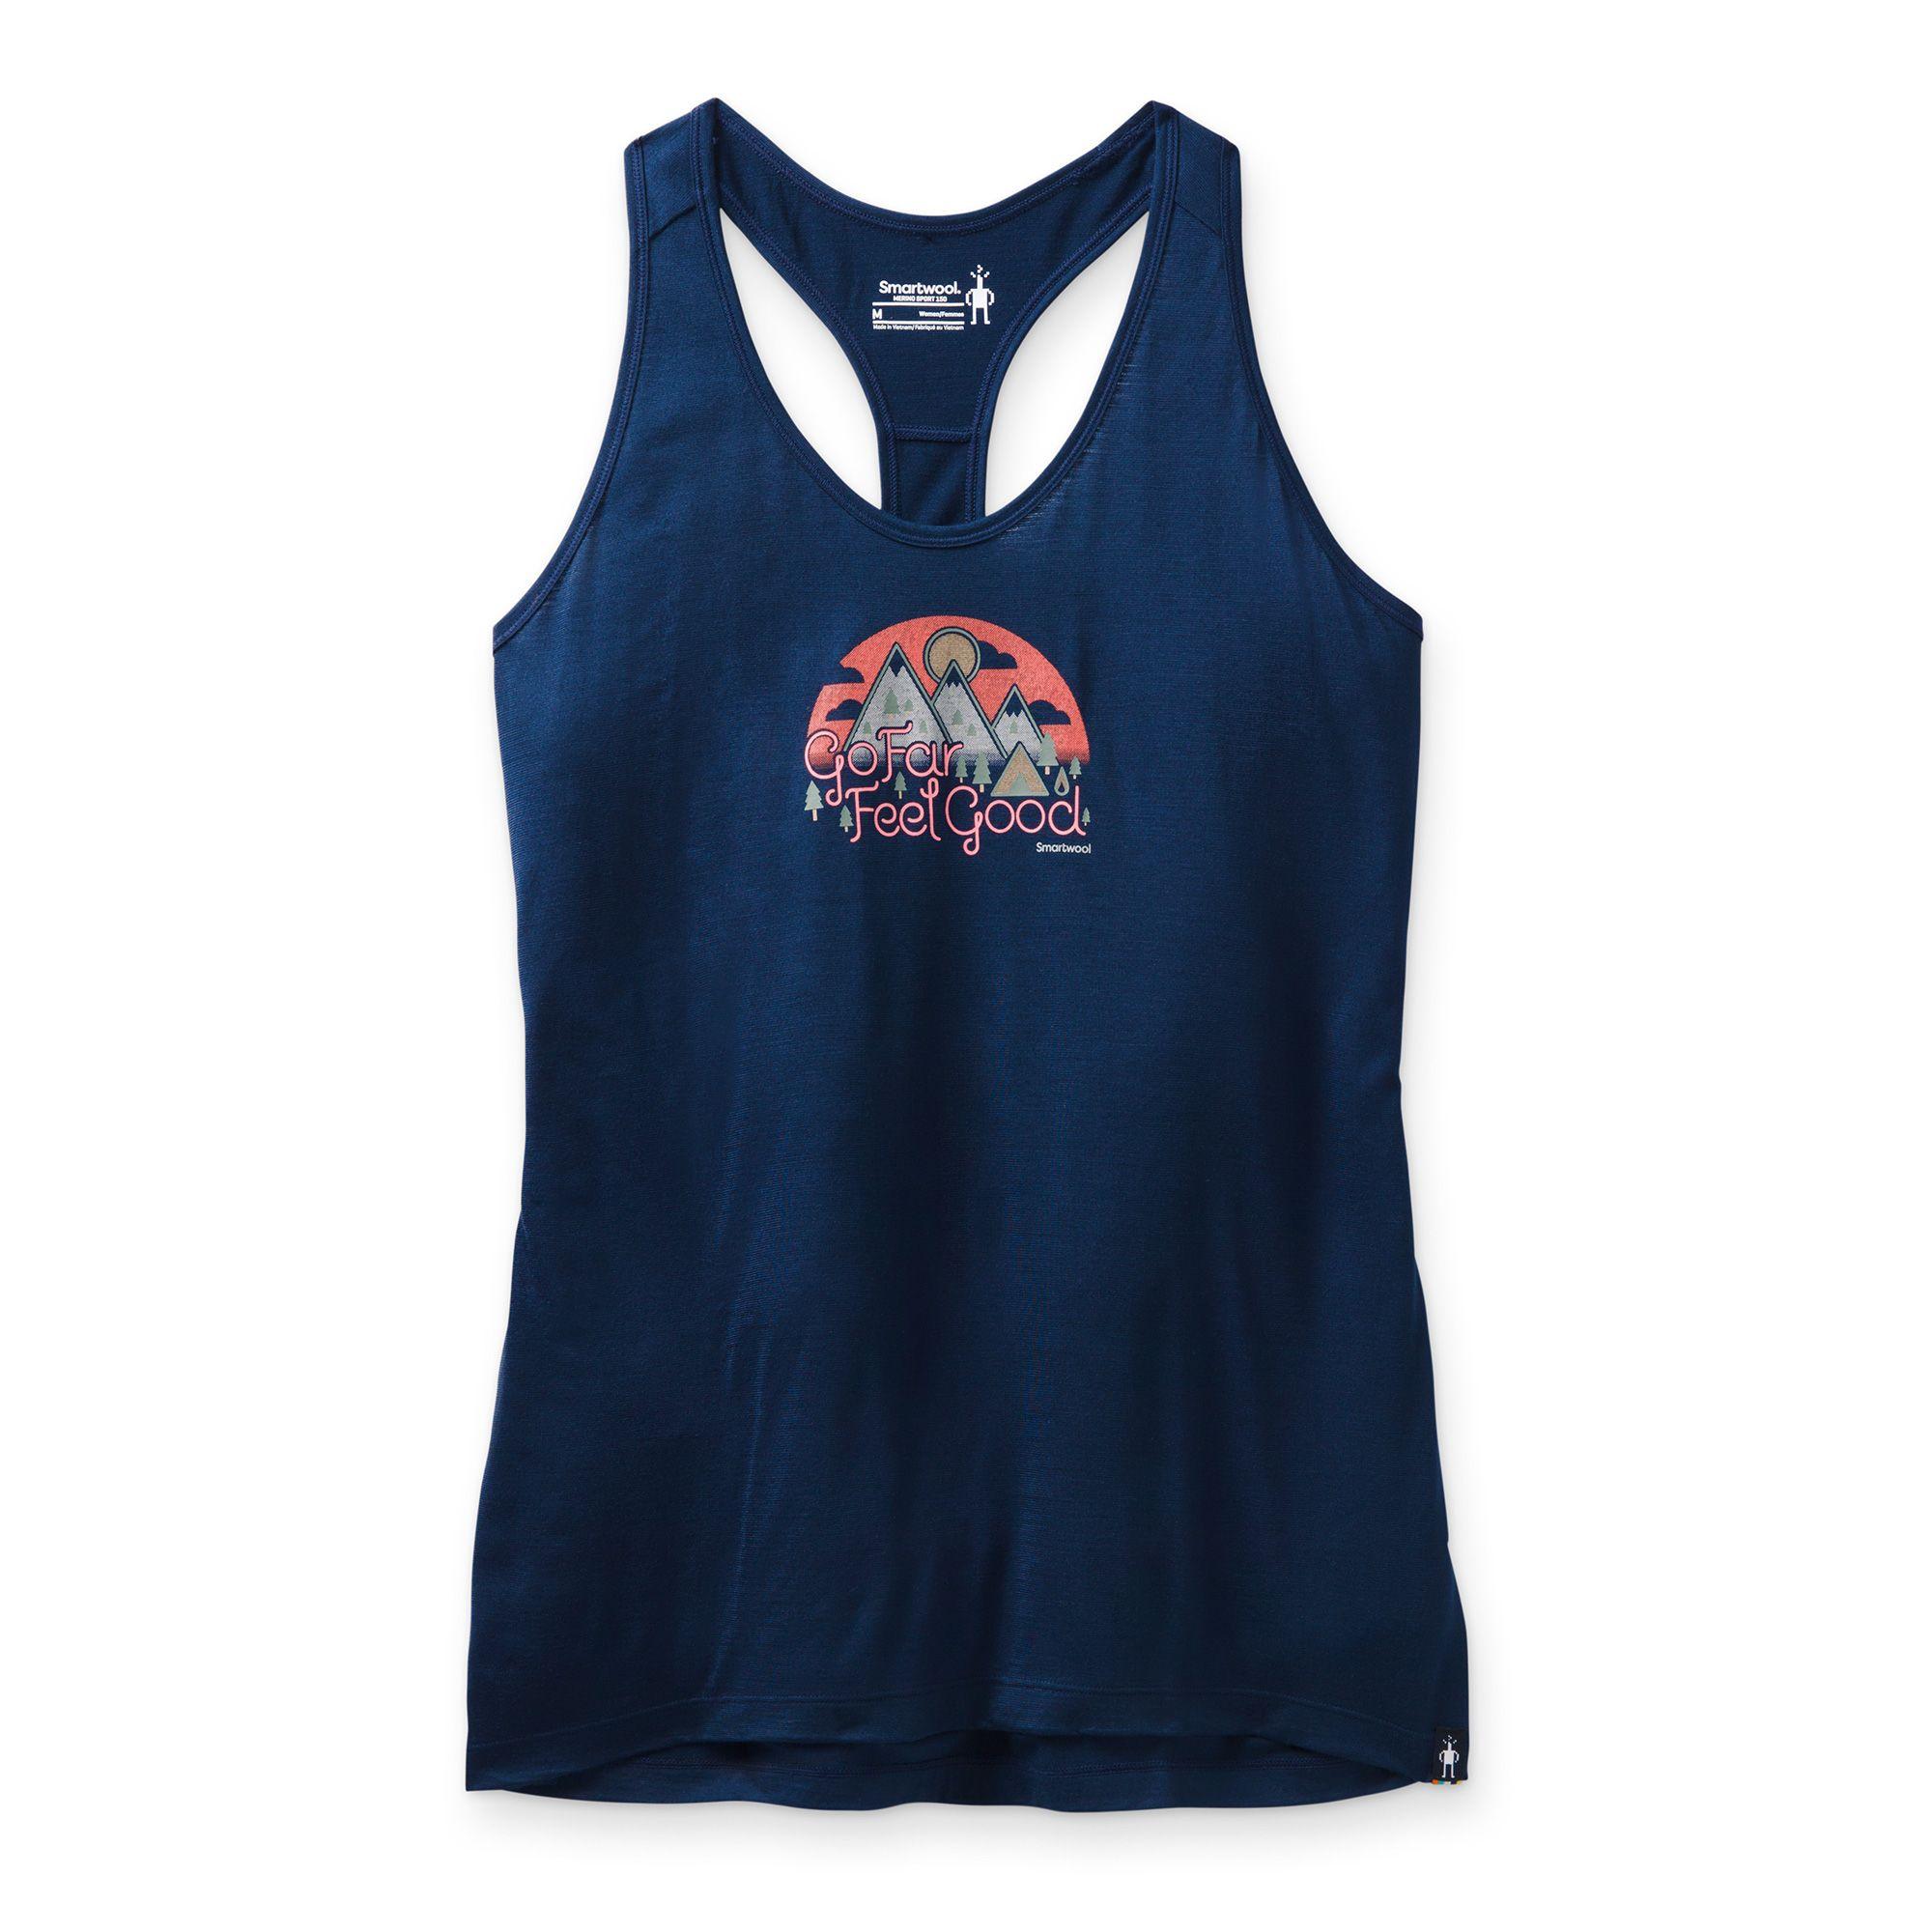 Camisole imprimée Merino Sport150 Go Far Feel Good pour femmes